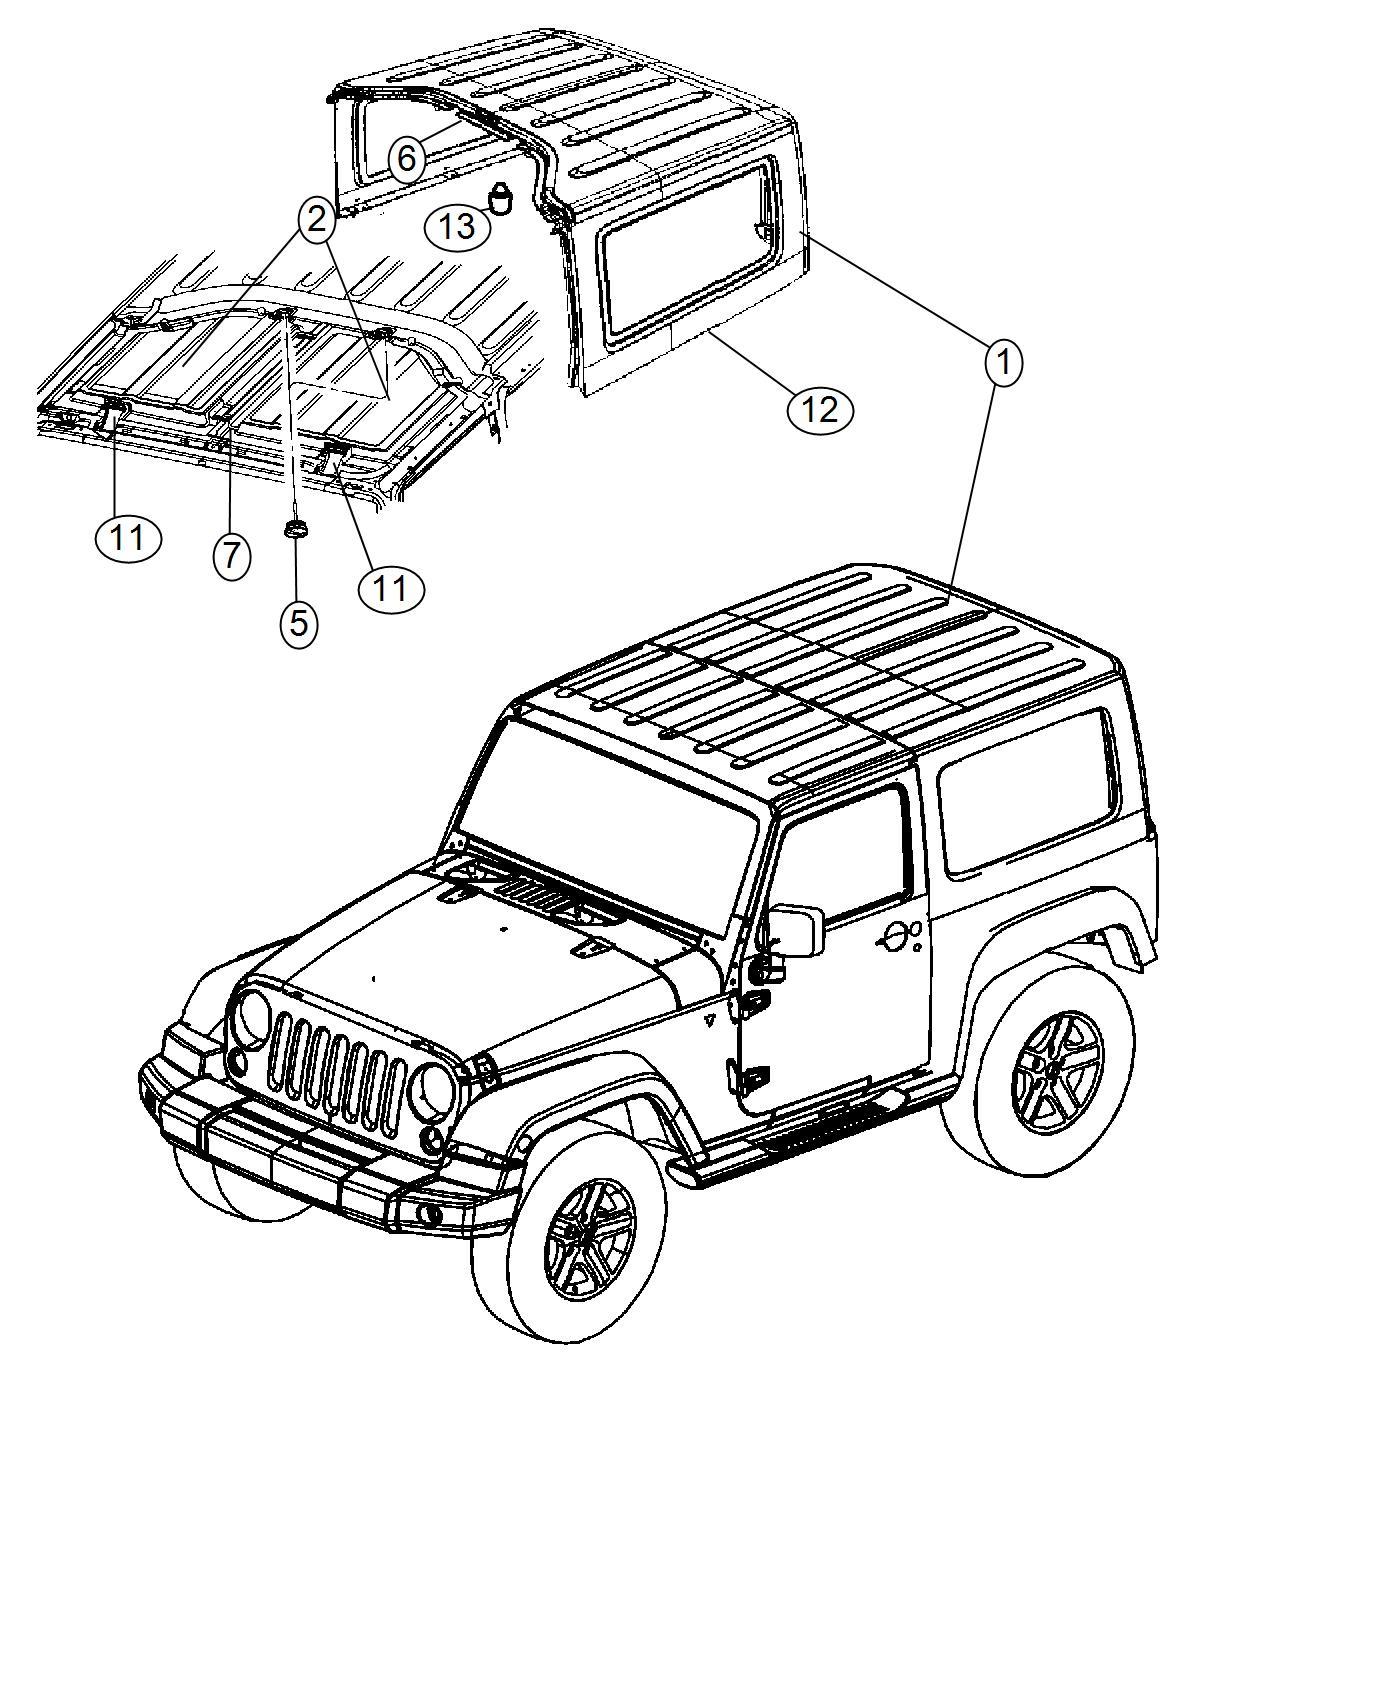 Jeep Wrangler Hardtop Black 3 Piece Hard Top